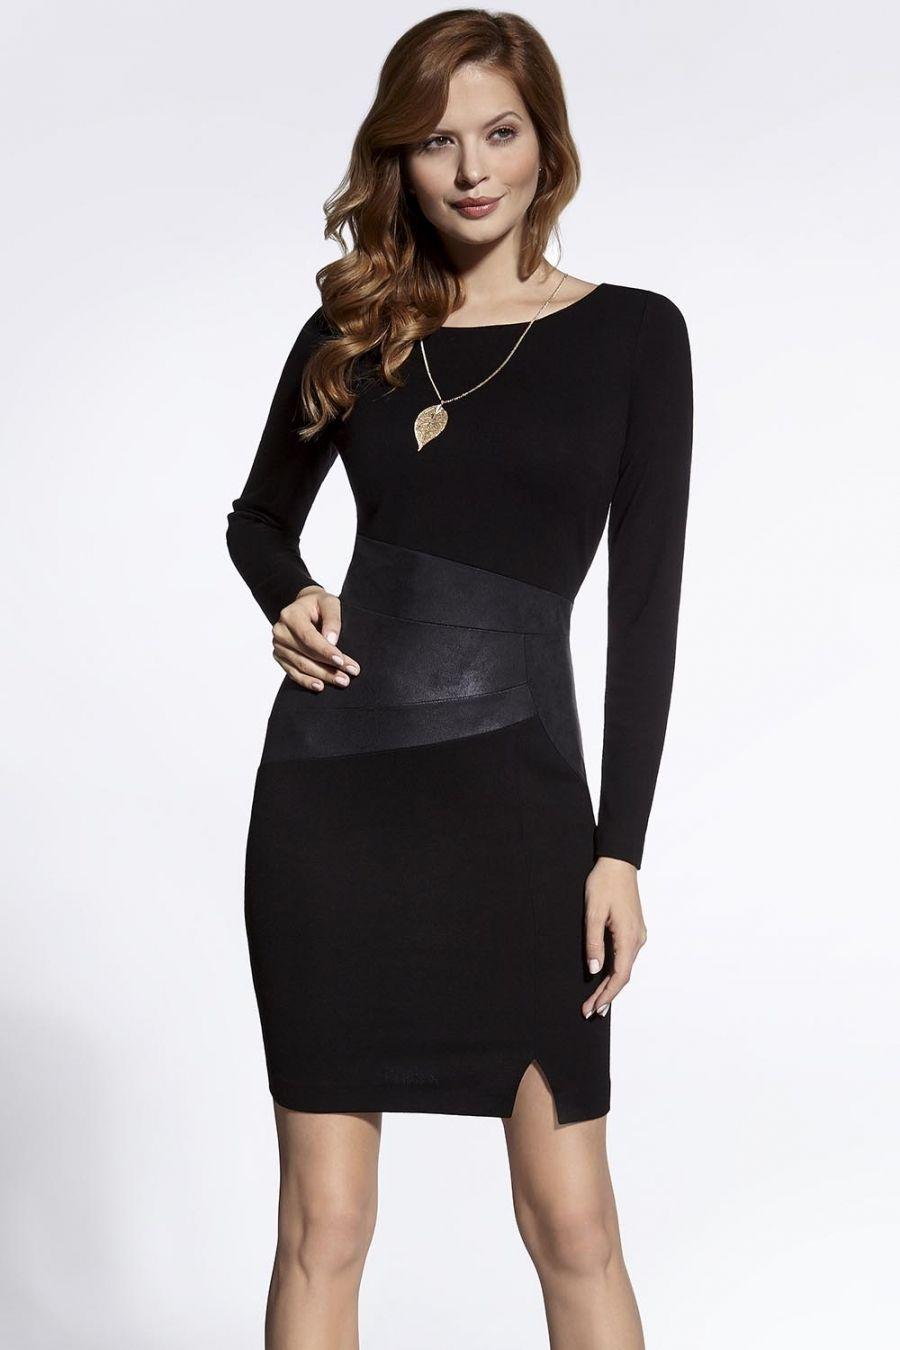 5d4cae22e1 Dress Enny 200003 - ZebrasBOX.com Fashion Store Online | bandage ...